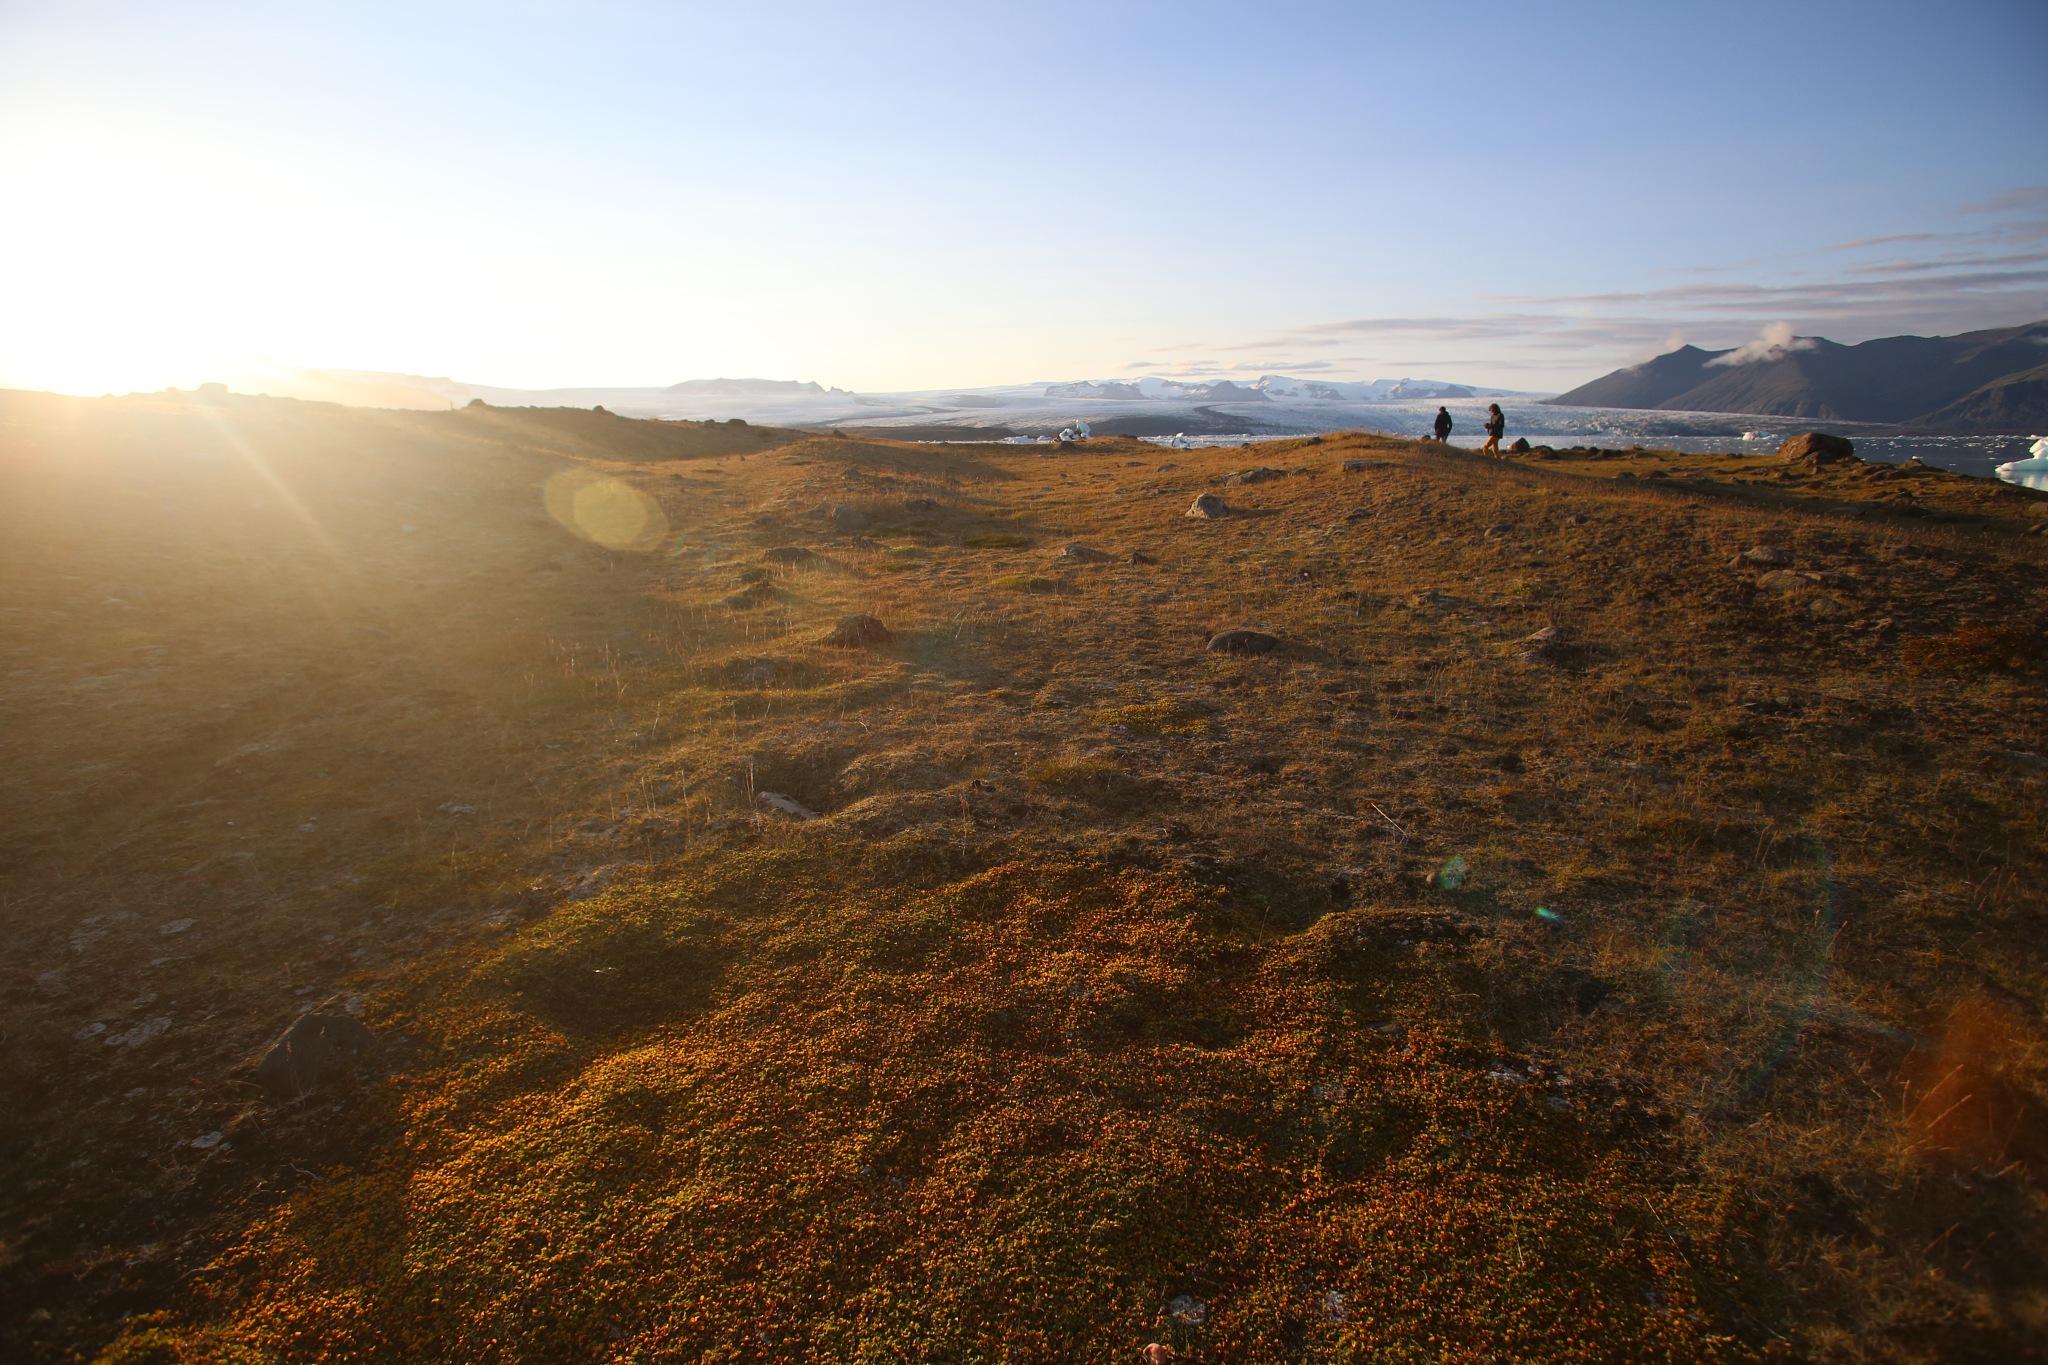 Jokulsarlon, Iceland by Rimantas Matulionis